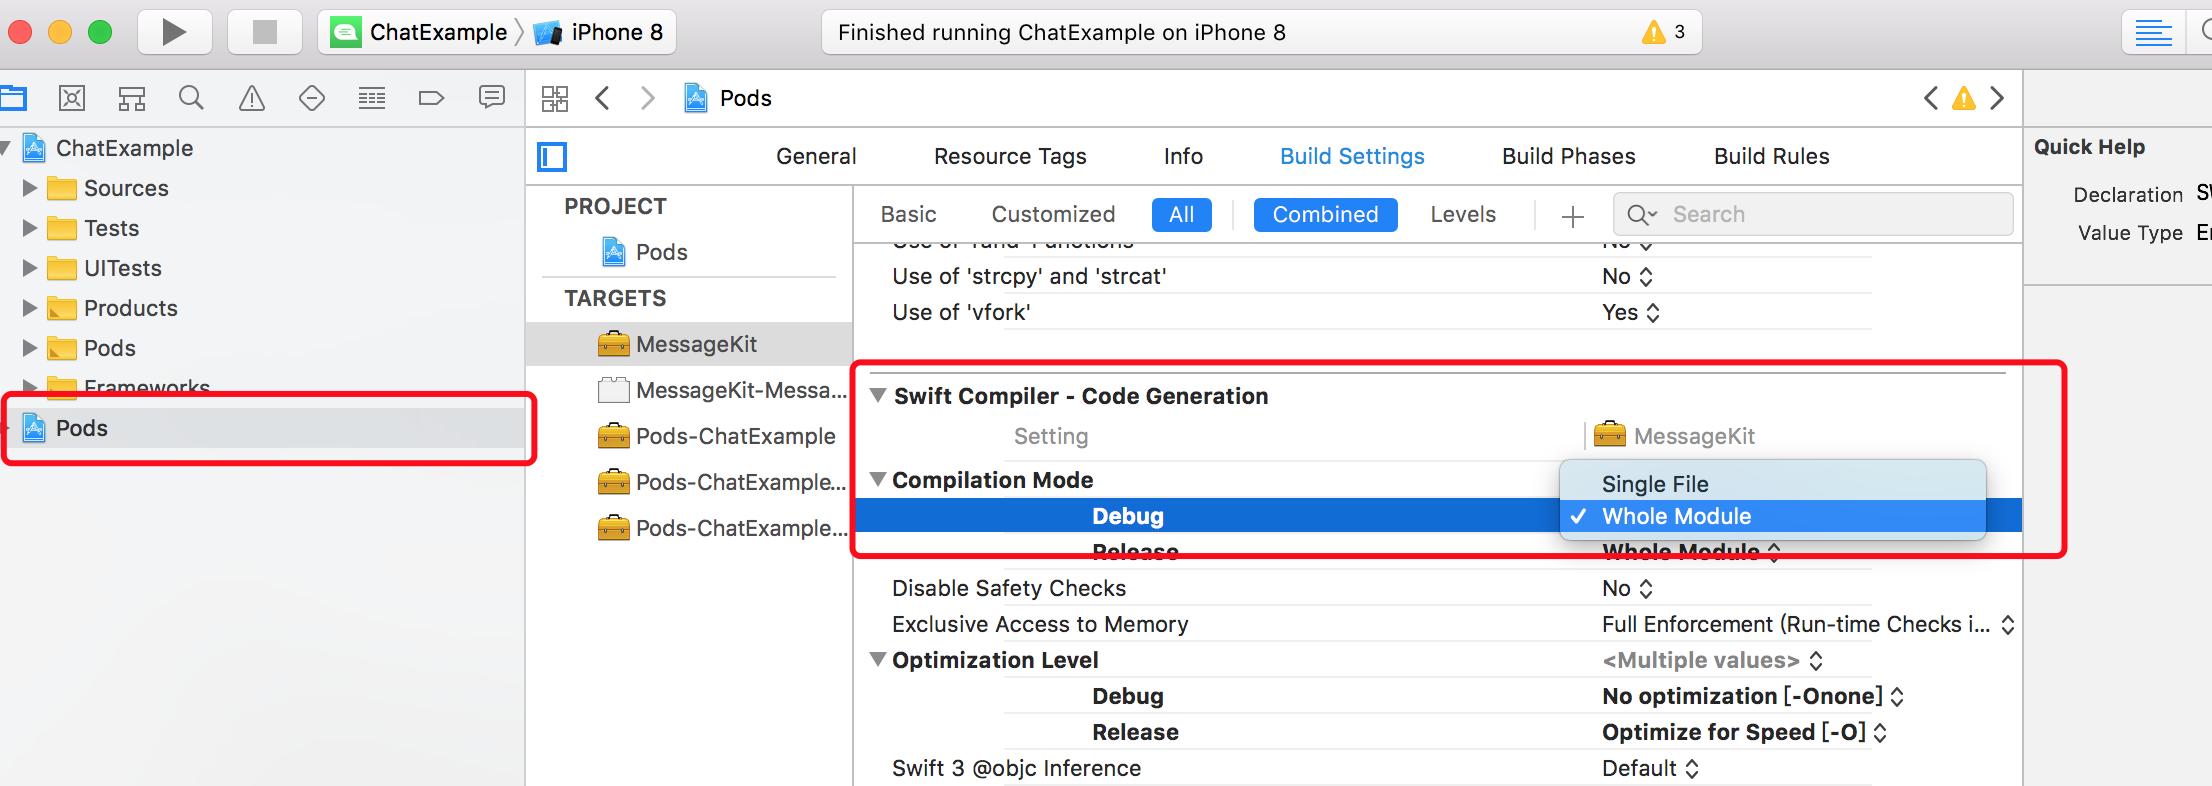 Developers - Segmentation fault: 11 on Xcode 9 3 -